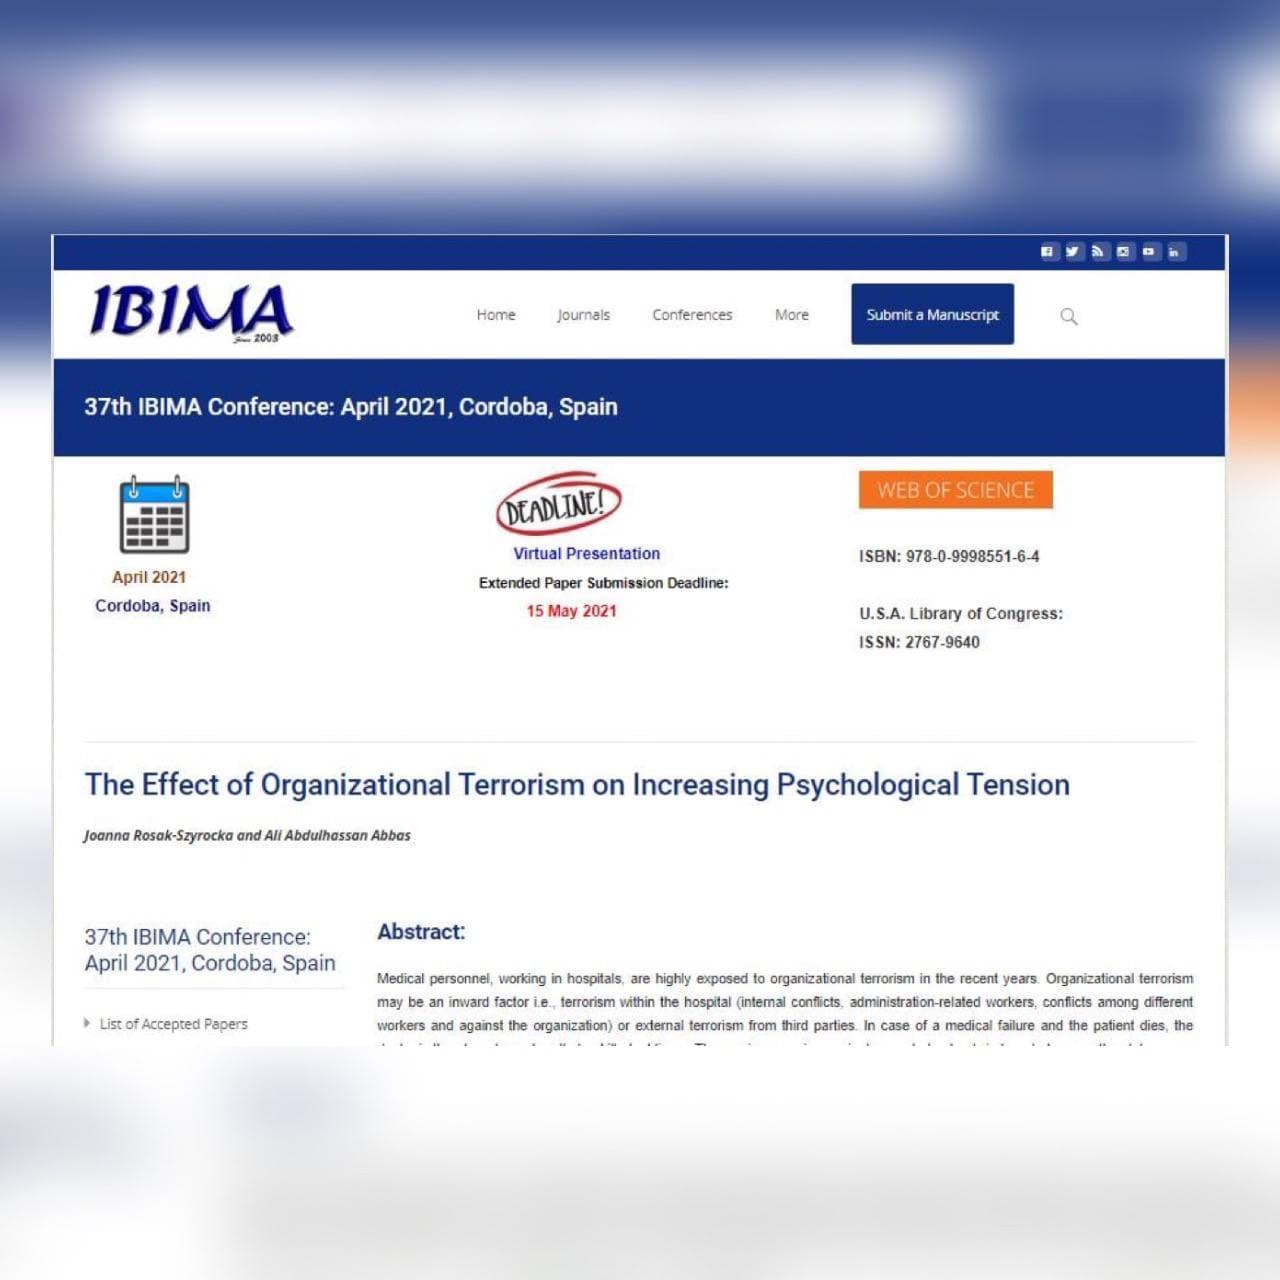 You are currently viewing تدريسي من جامعة كربلاء  يشارك في المؤتمر السابع والثلاثون للجمعية الدولية لإدارة معلومات الأعمال IBIMA) 1-2)